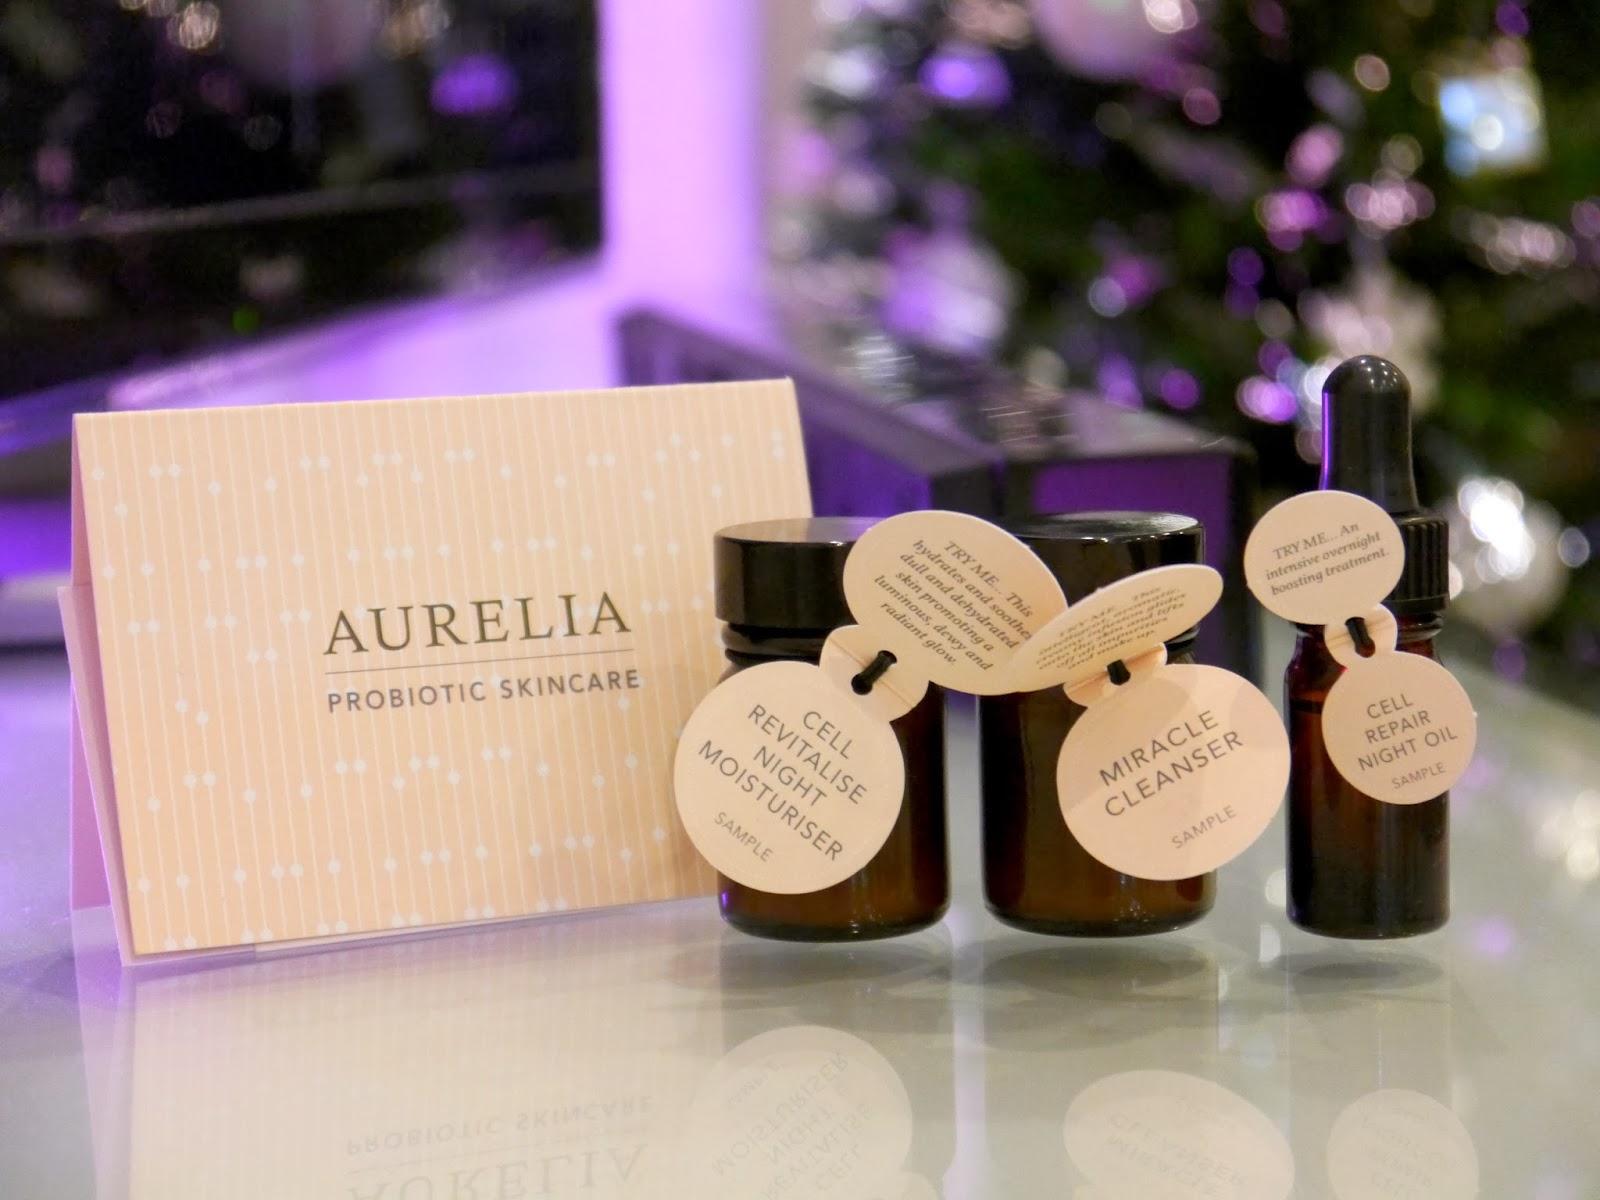 http://www.thebeautyboardroom.com/2014/01/aurelia-probiotic-skincare.html